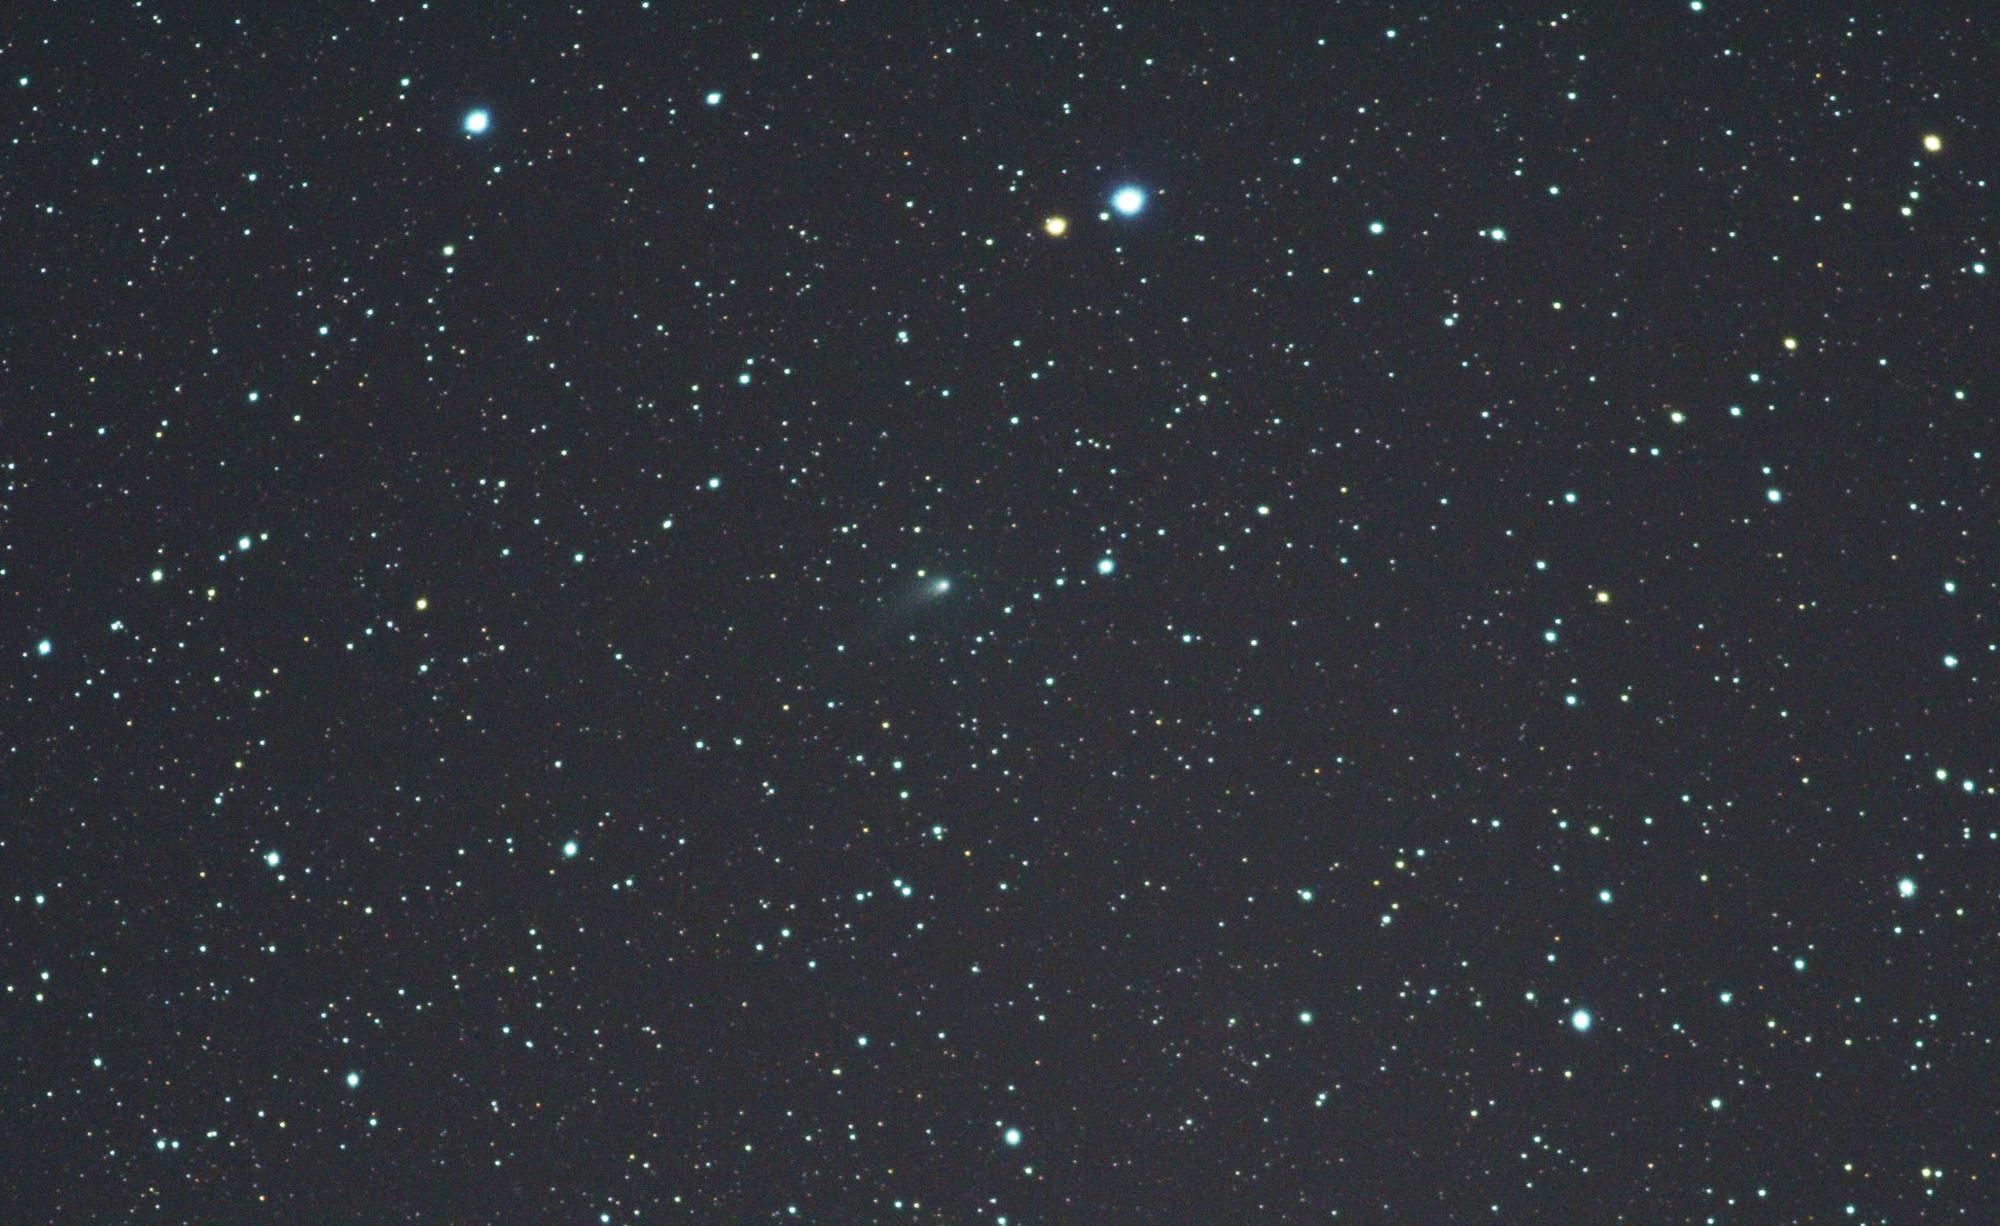 Comète 2017 T2 PanSTARRS 1020B3 send.jpg